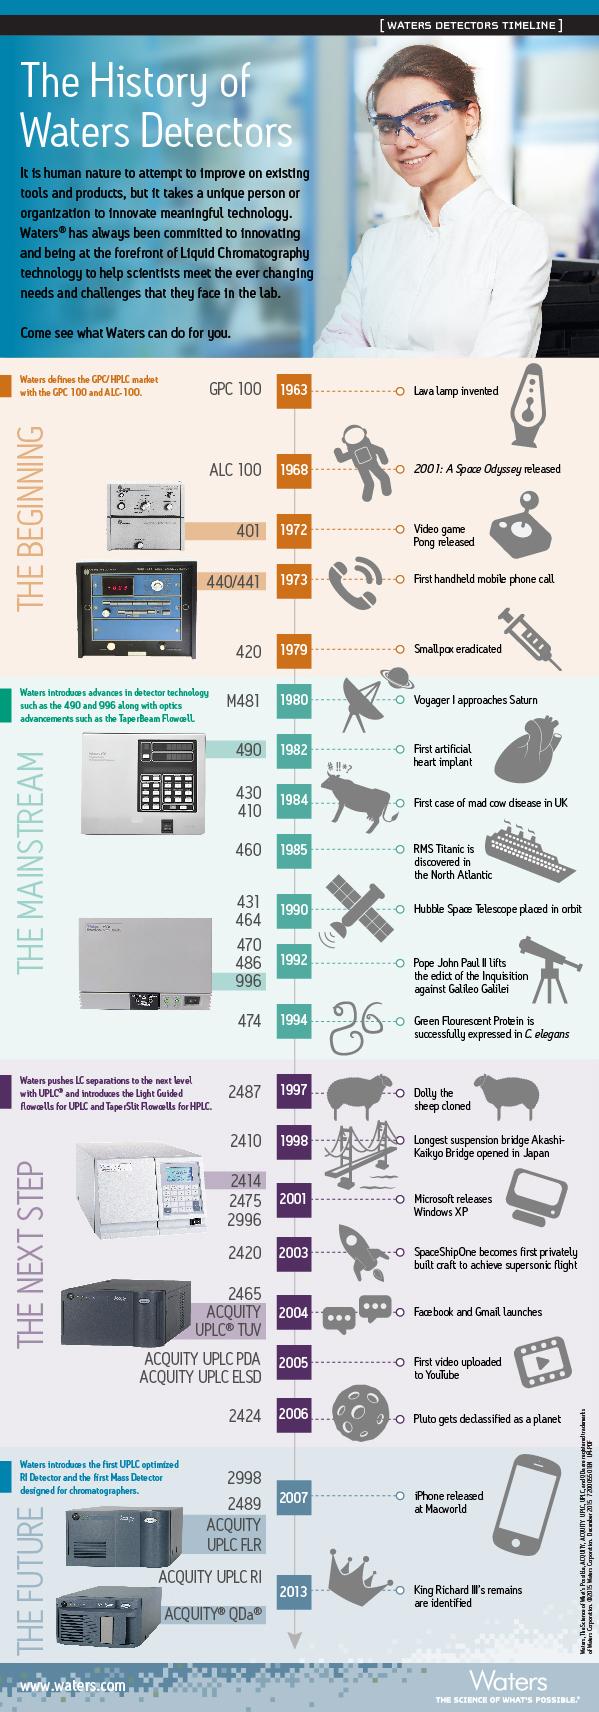 Detectors Timeline Infographic